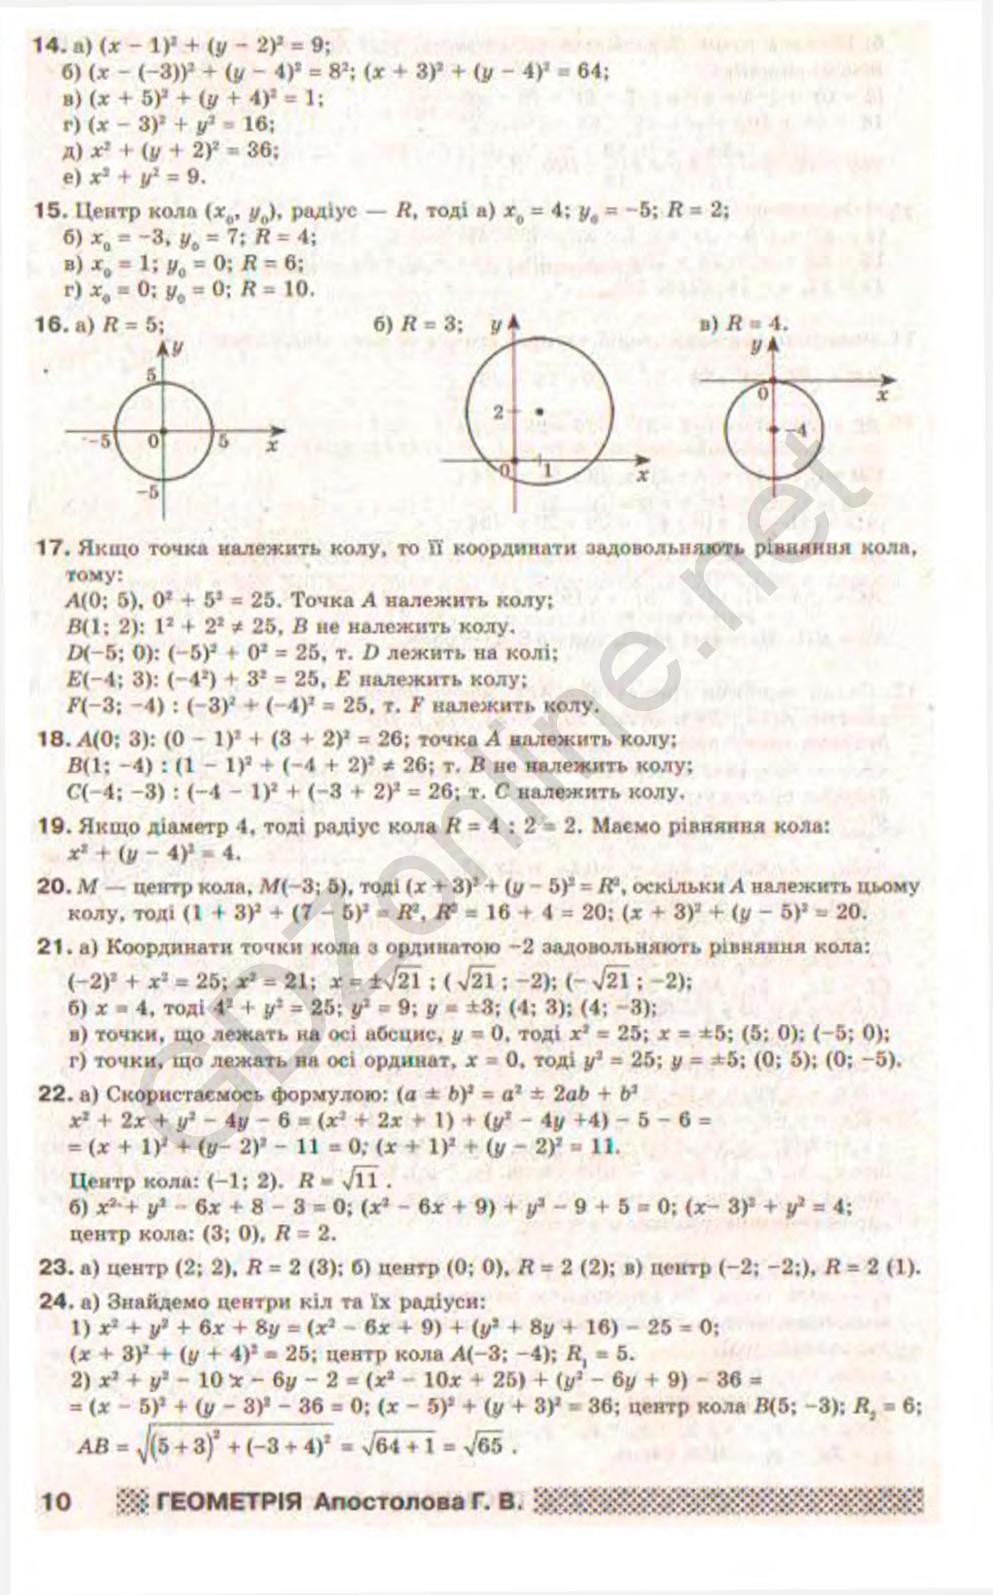 Решебник 9 класс геометрия а г апостолова